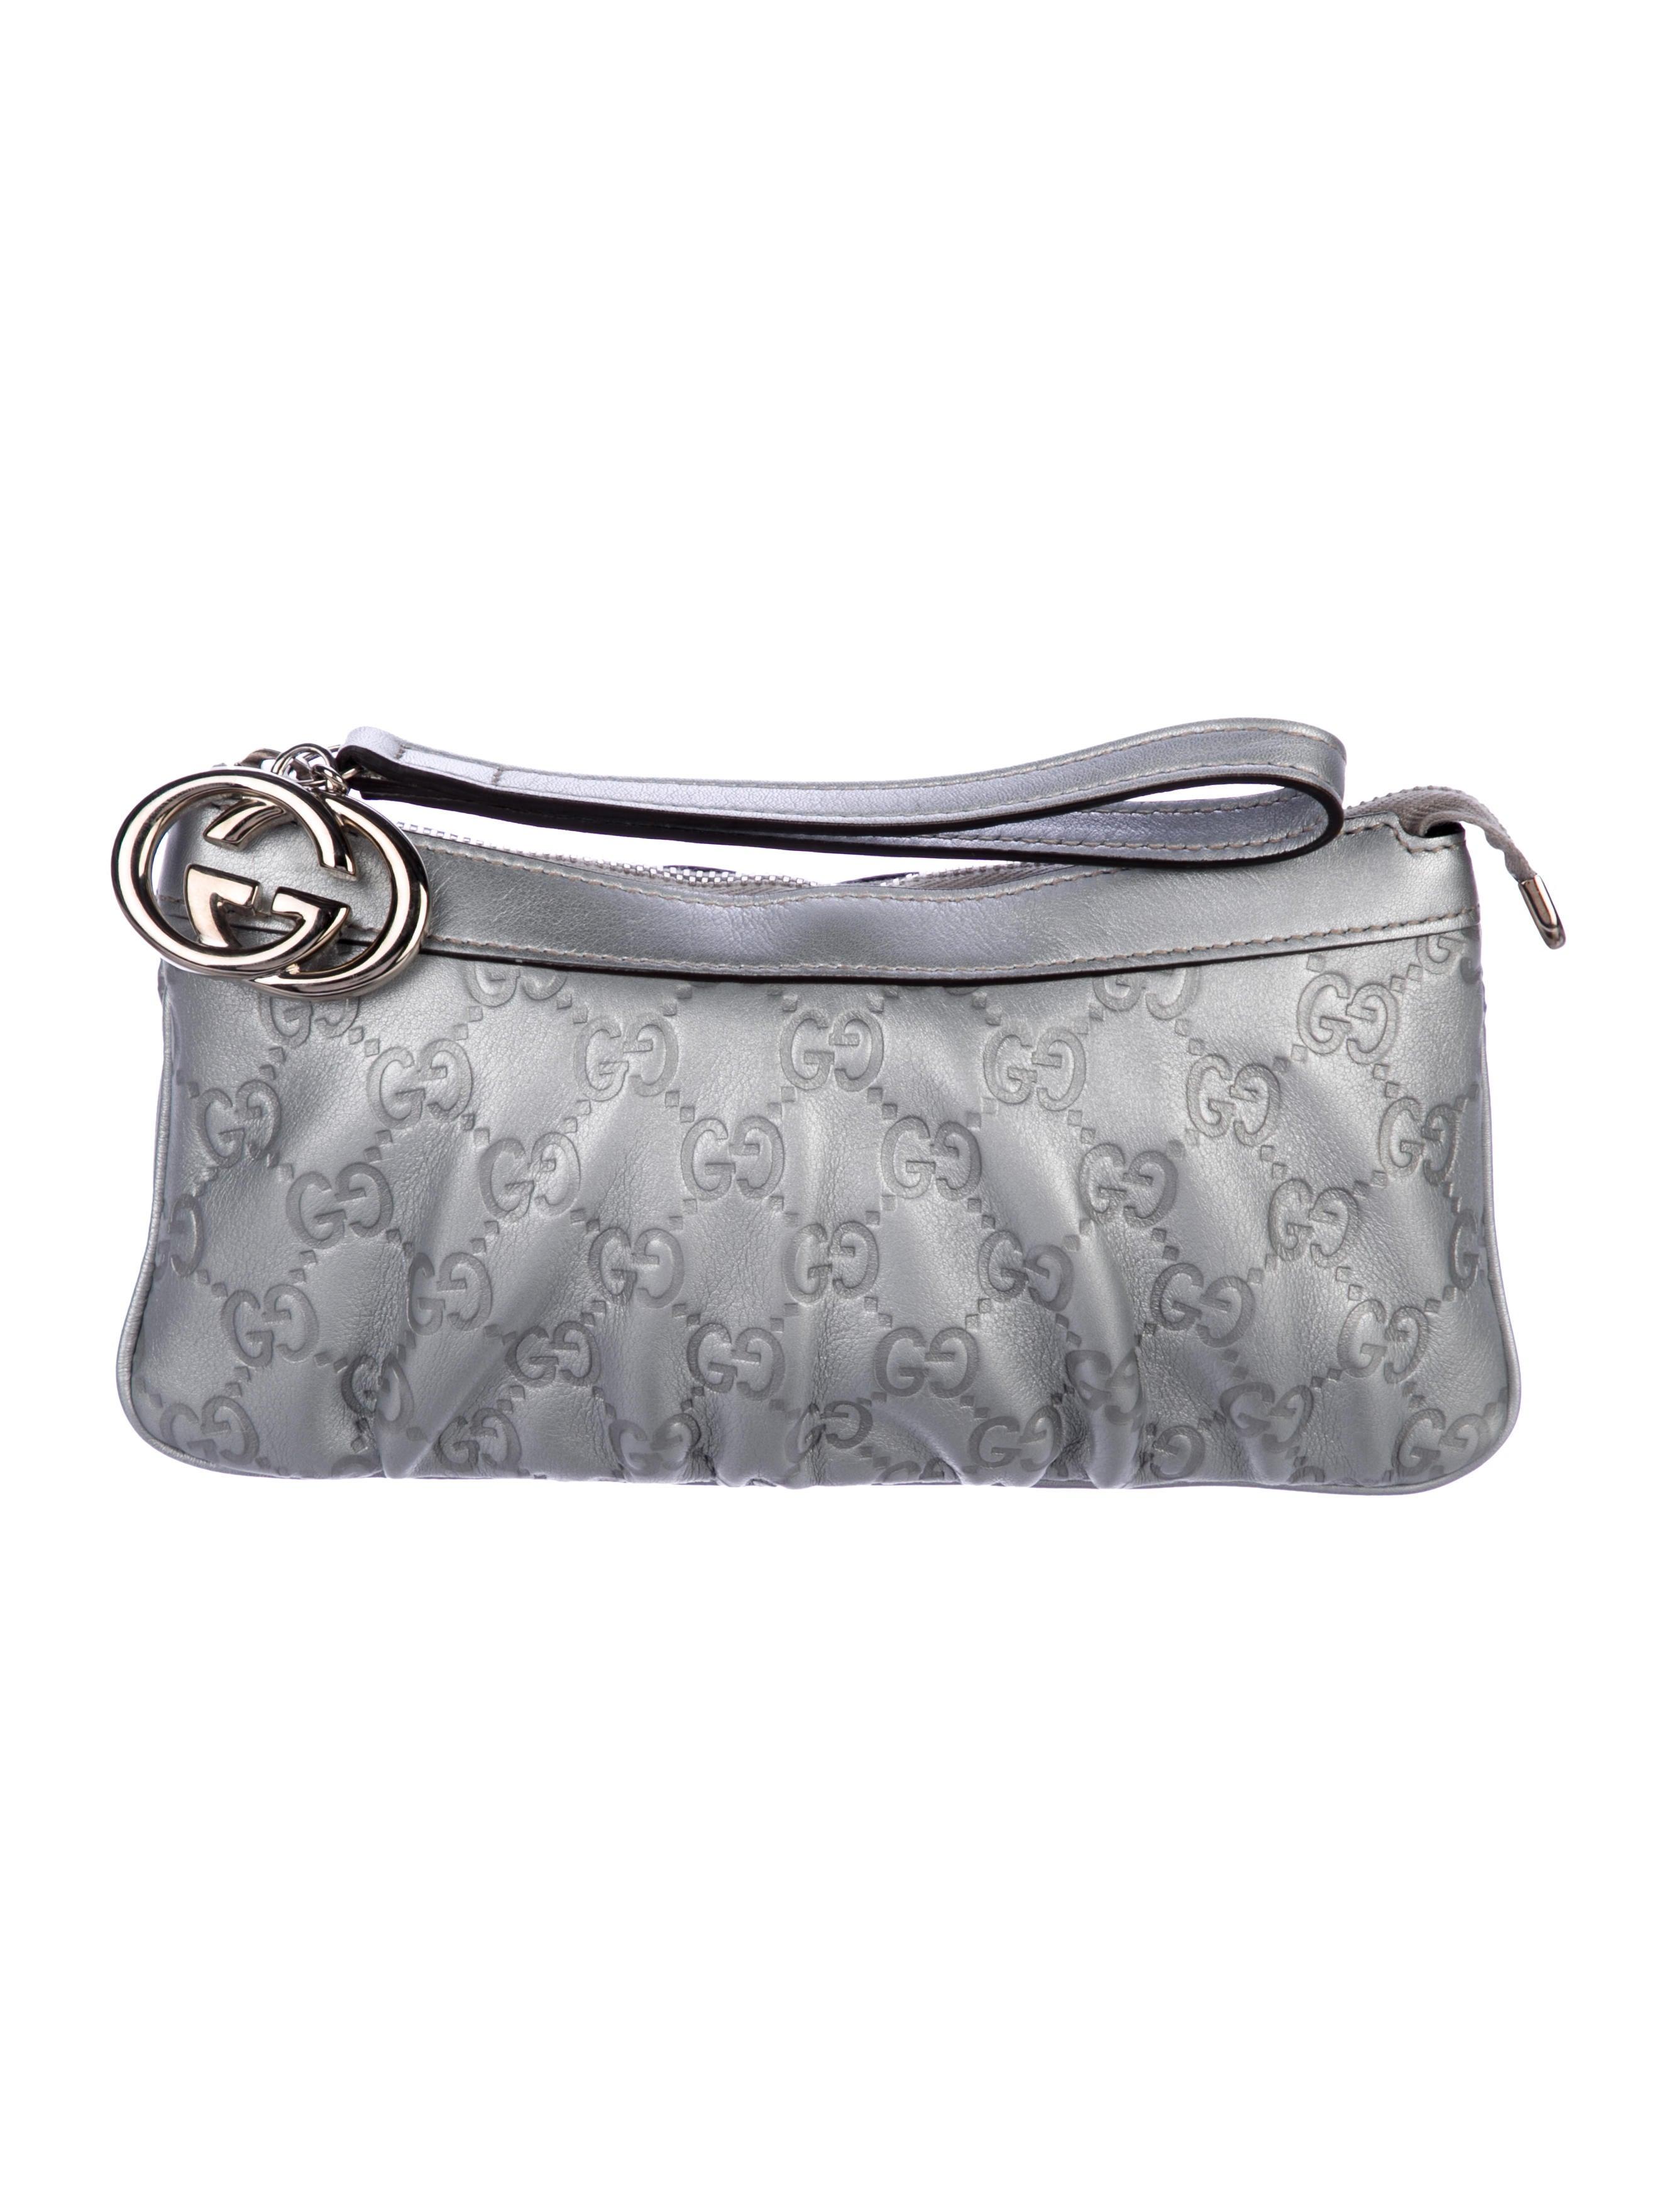 784129b2183 Gucci Guccissima New Britt Wristlet - Handbags - GUC223206